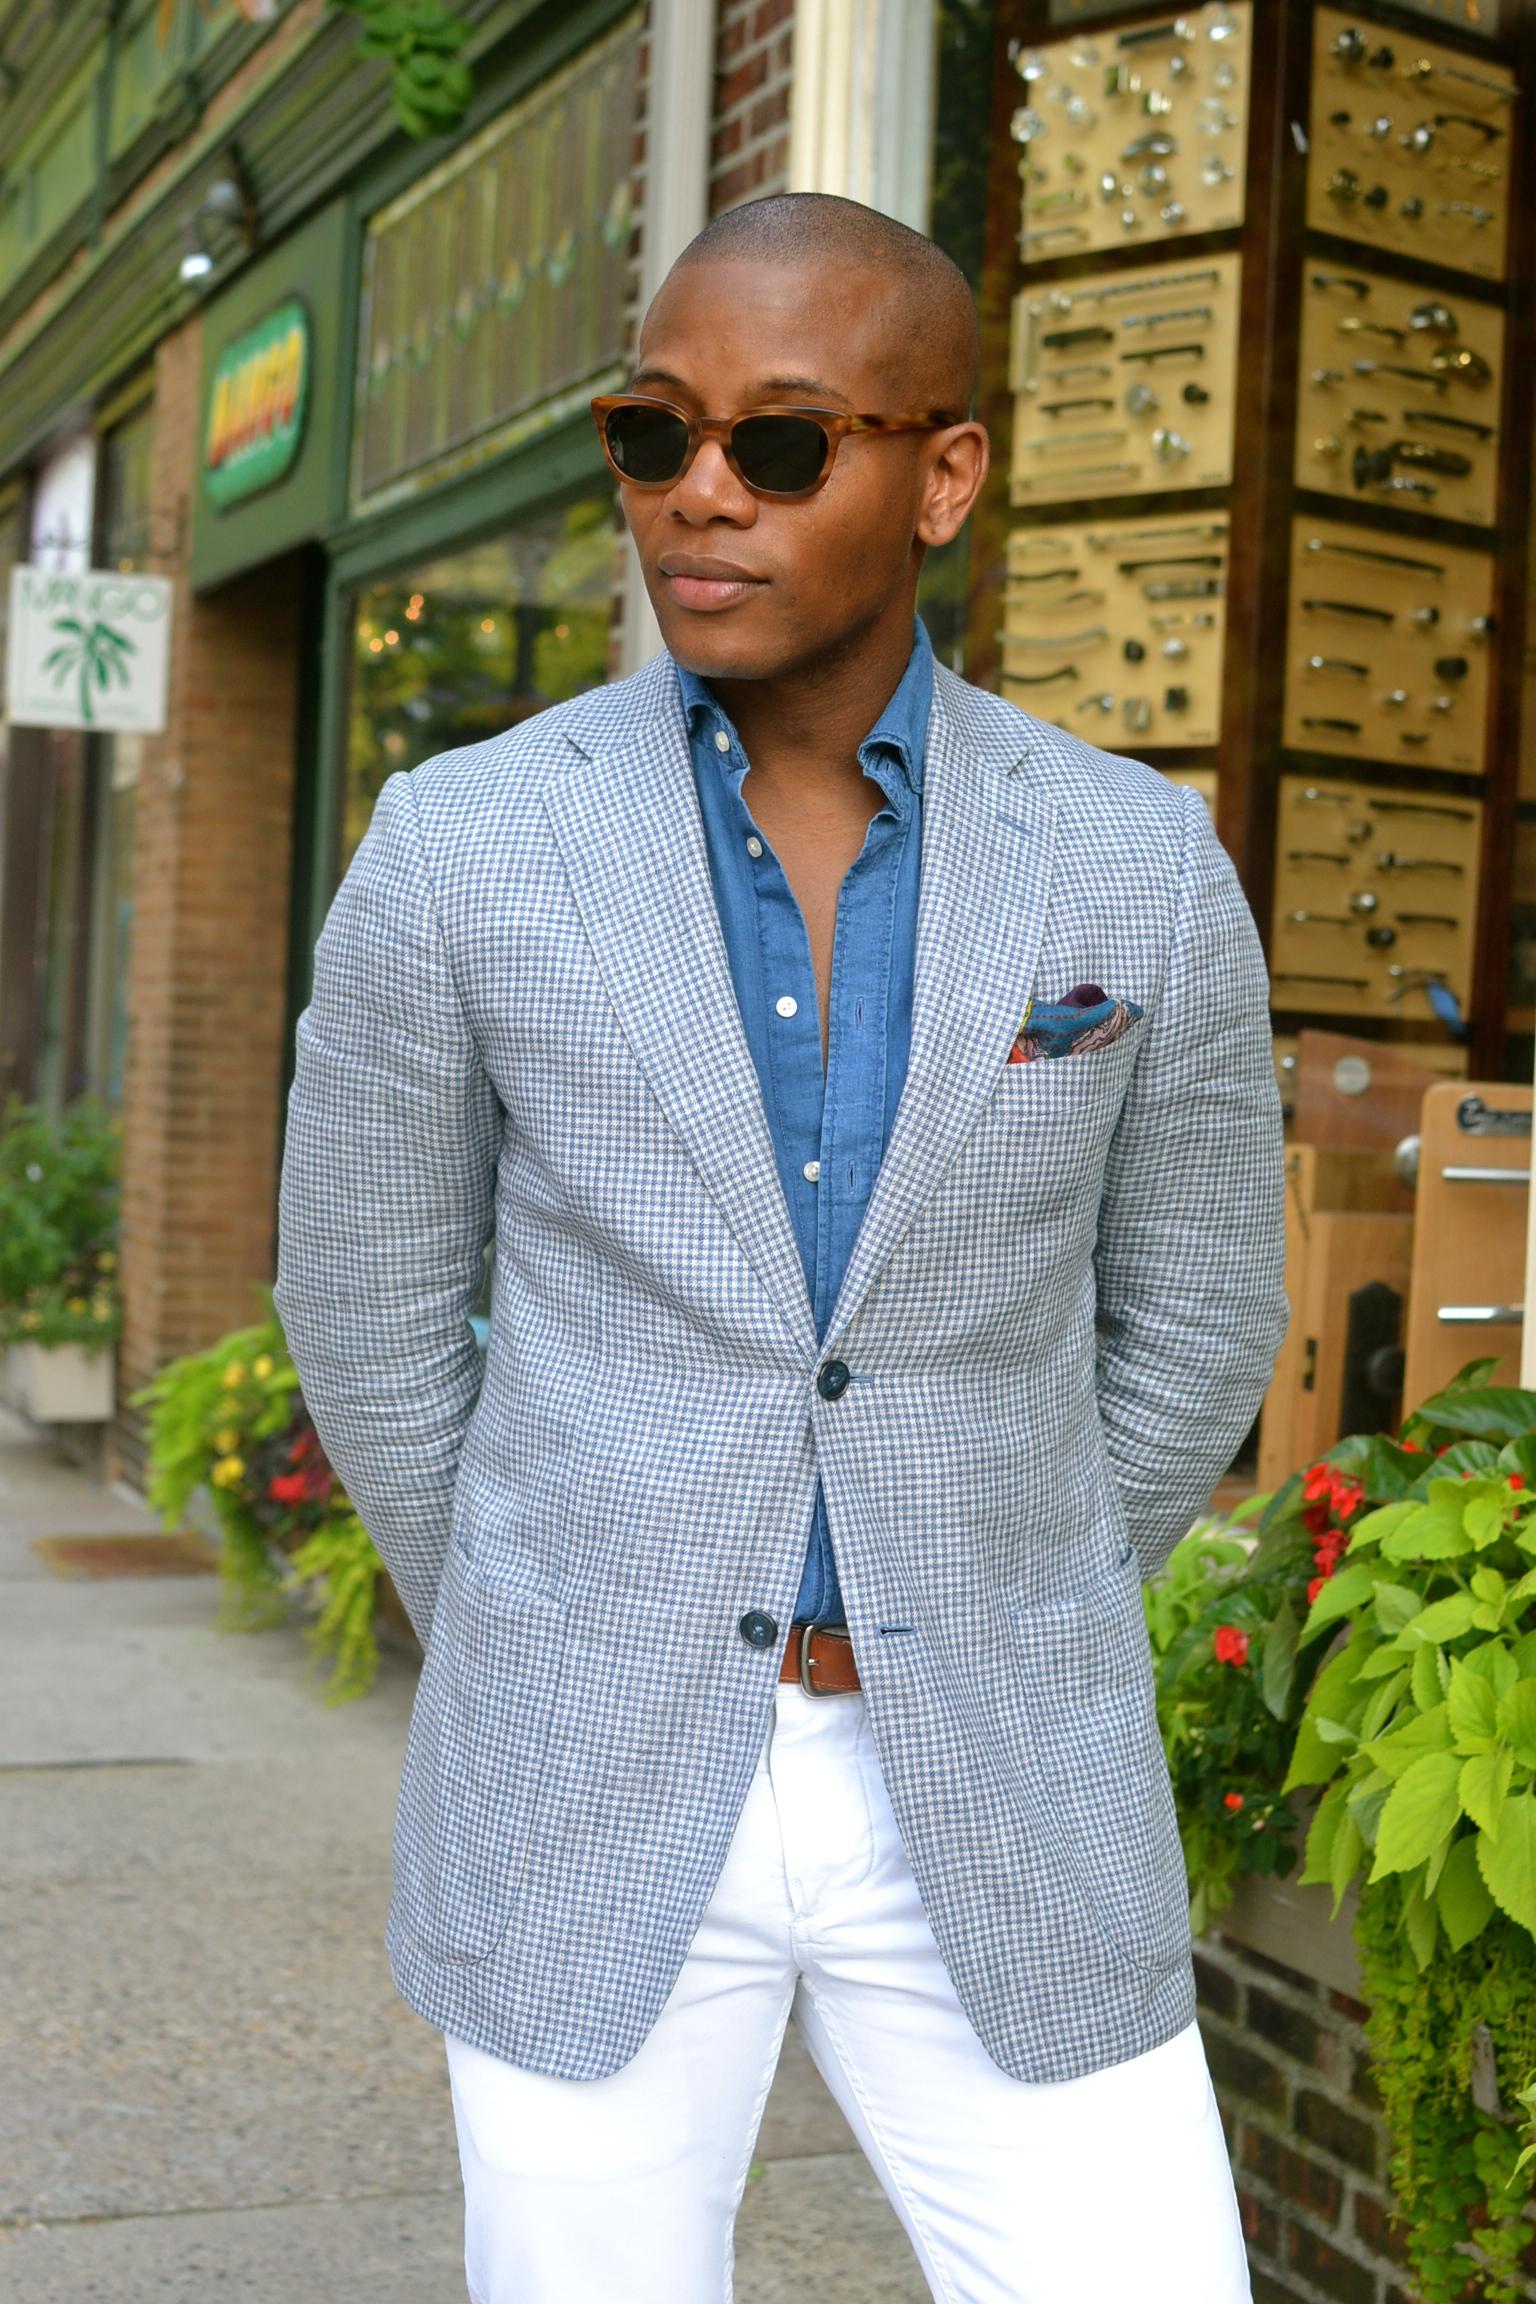 Blue Ellington Moc Toe Loafers on Men's Style Pro